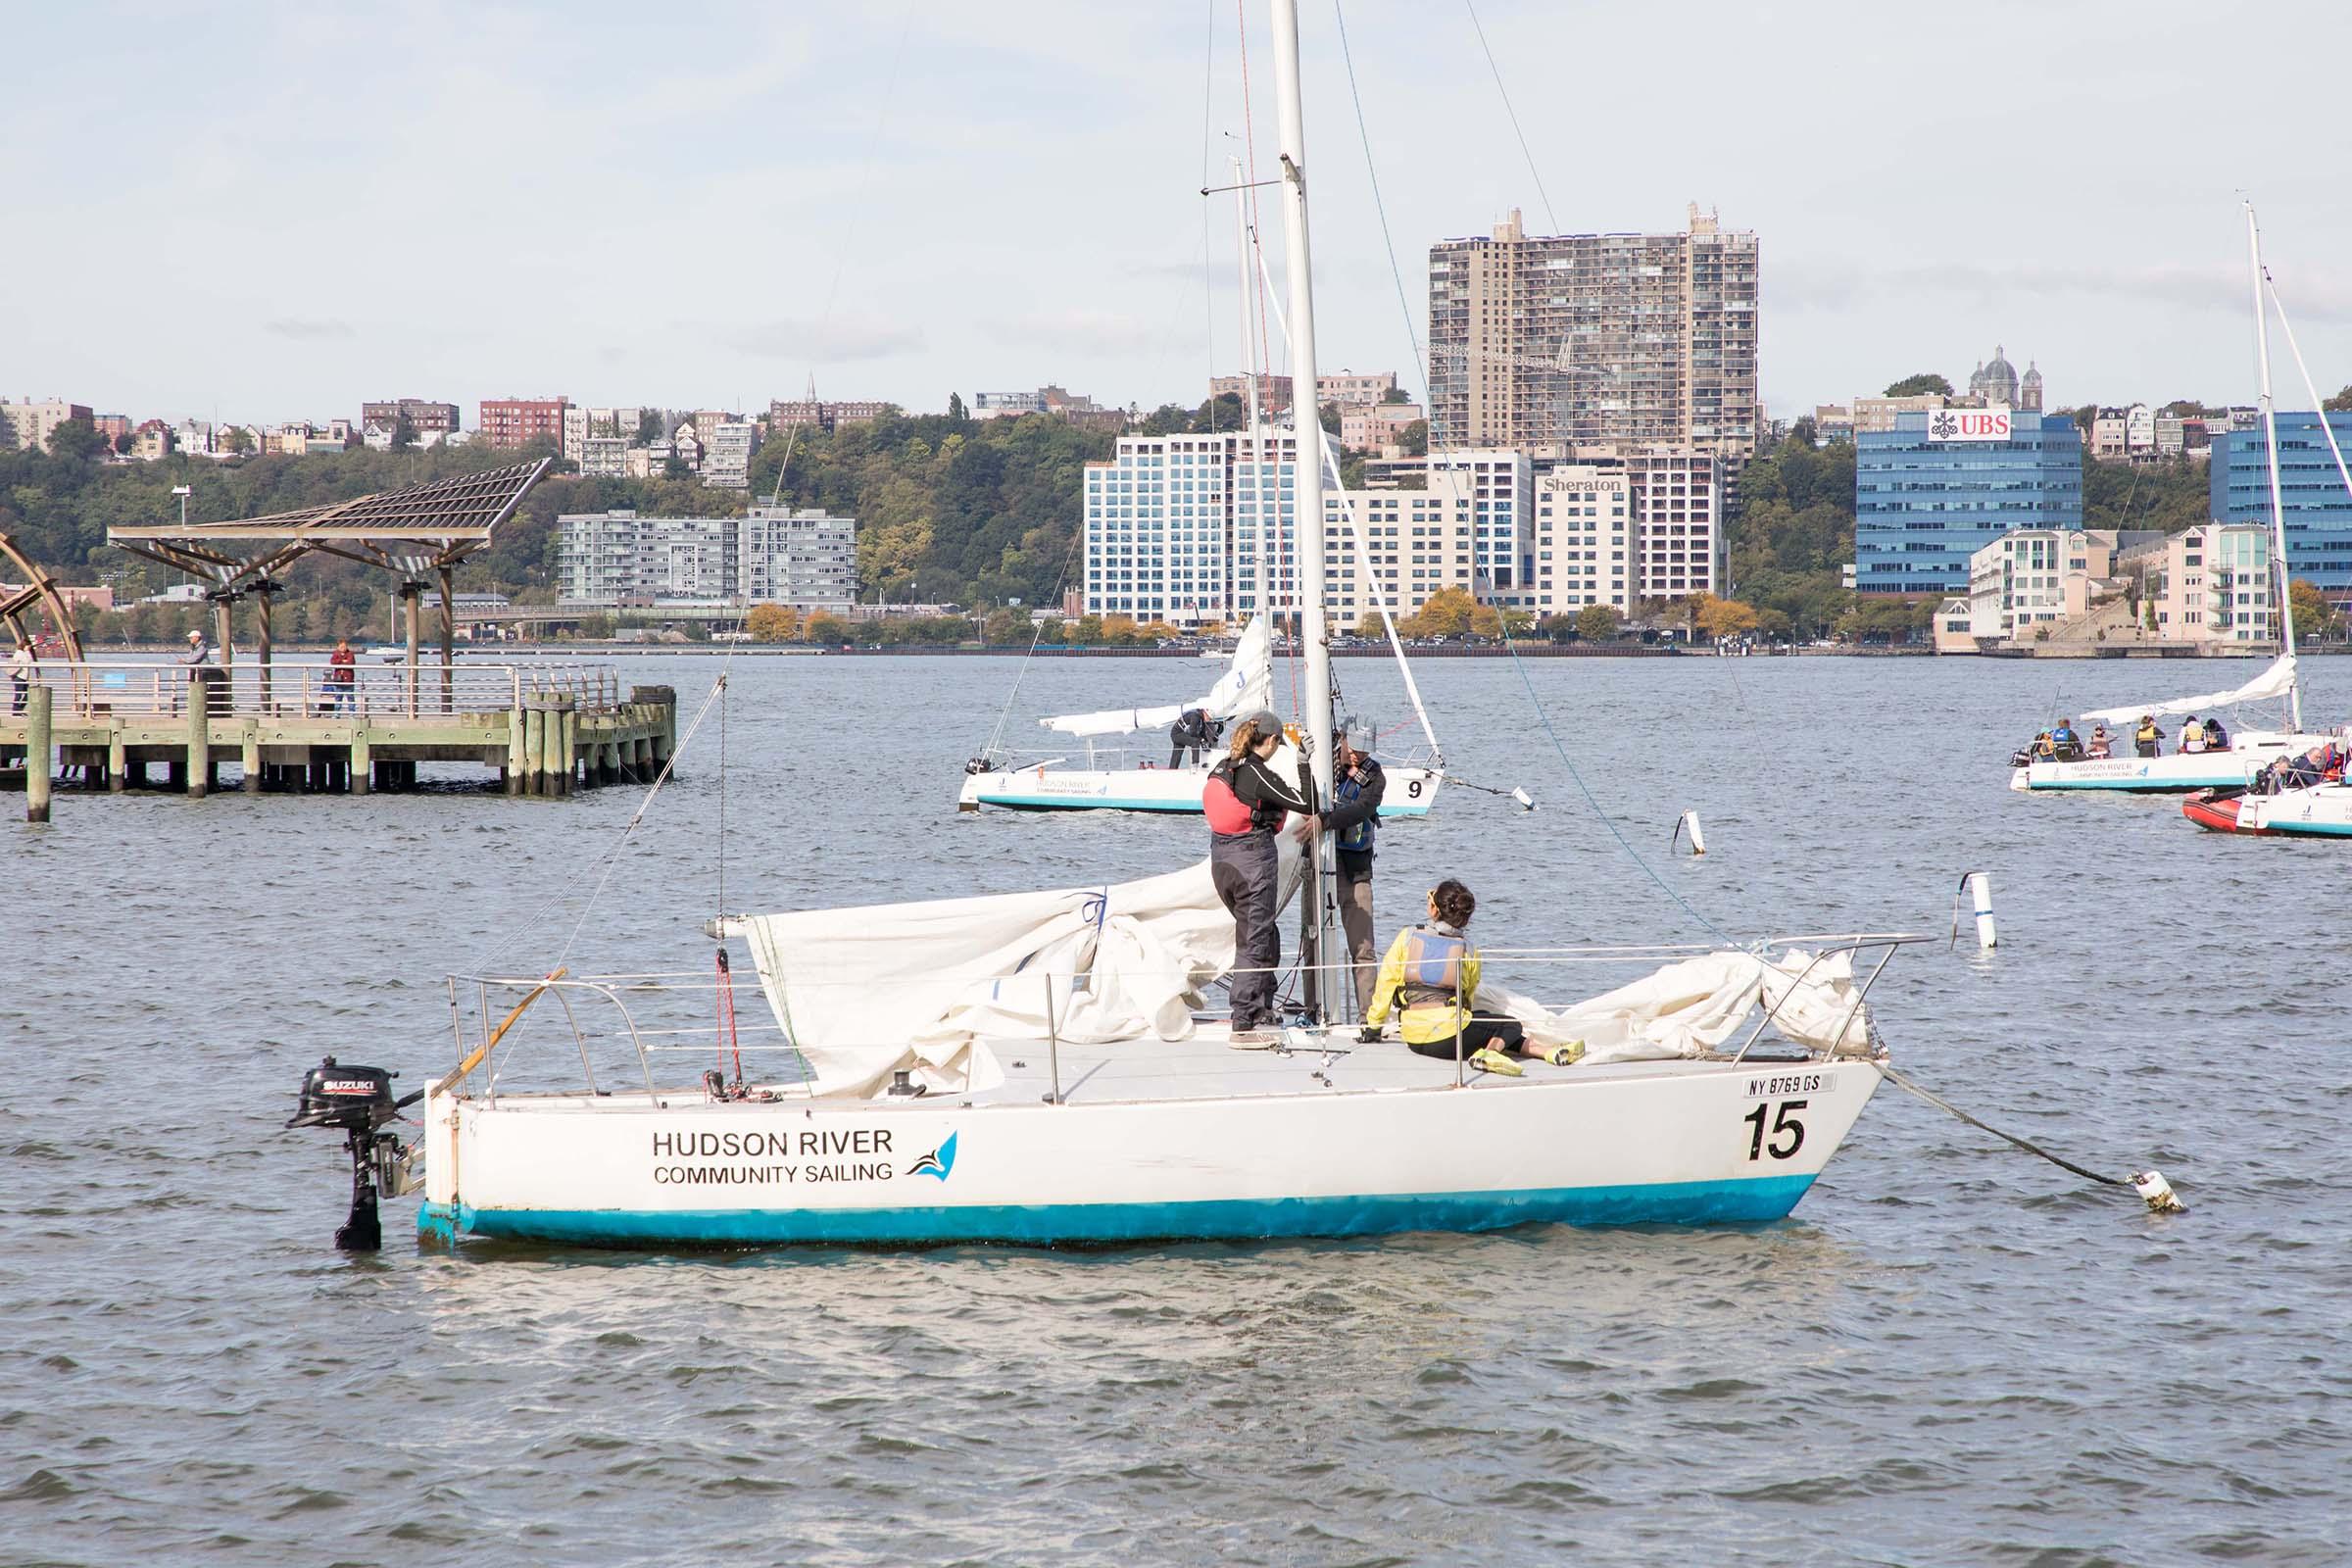 Sailing with the Hudson River Community Sailing program near Pier 66